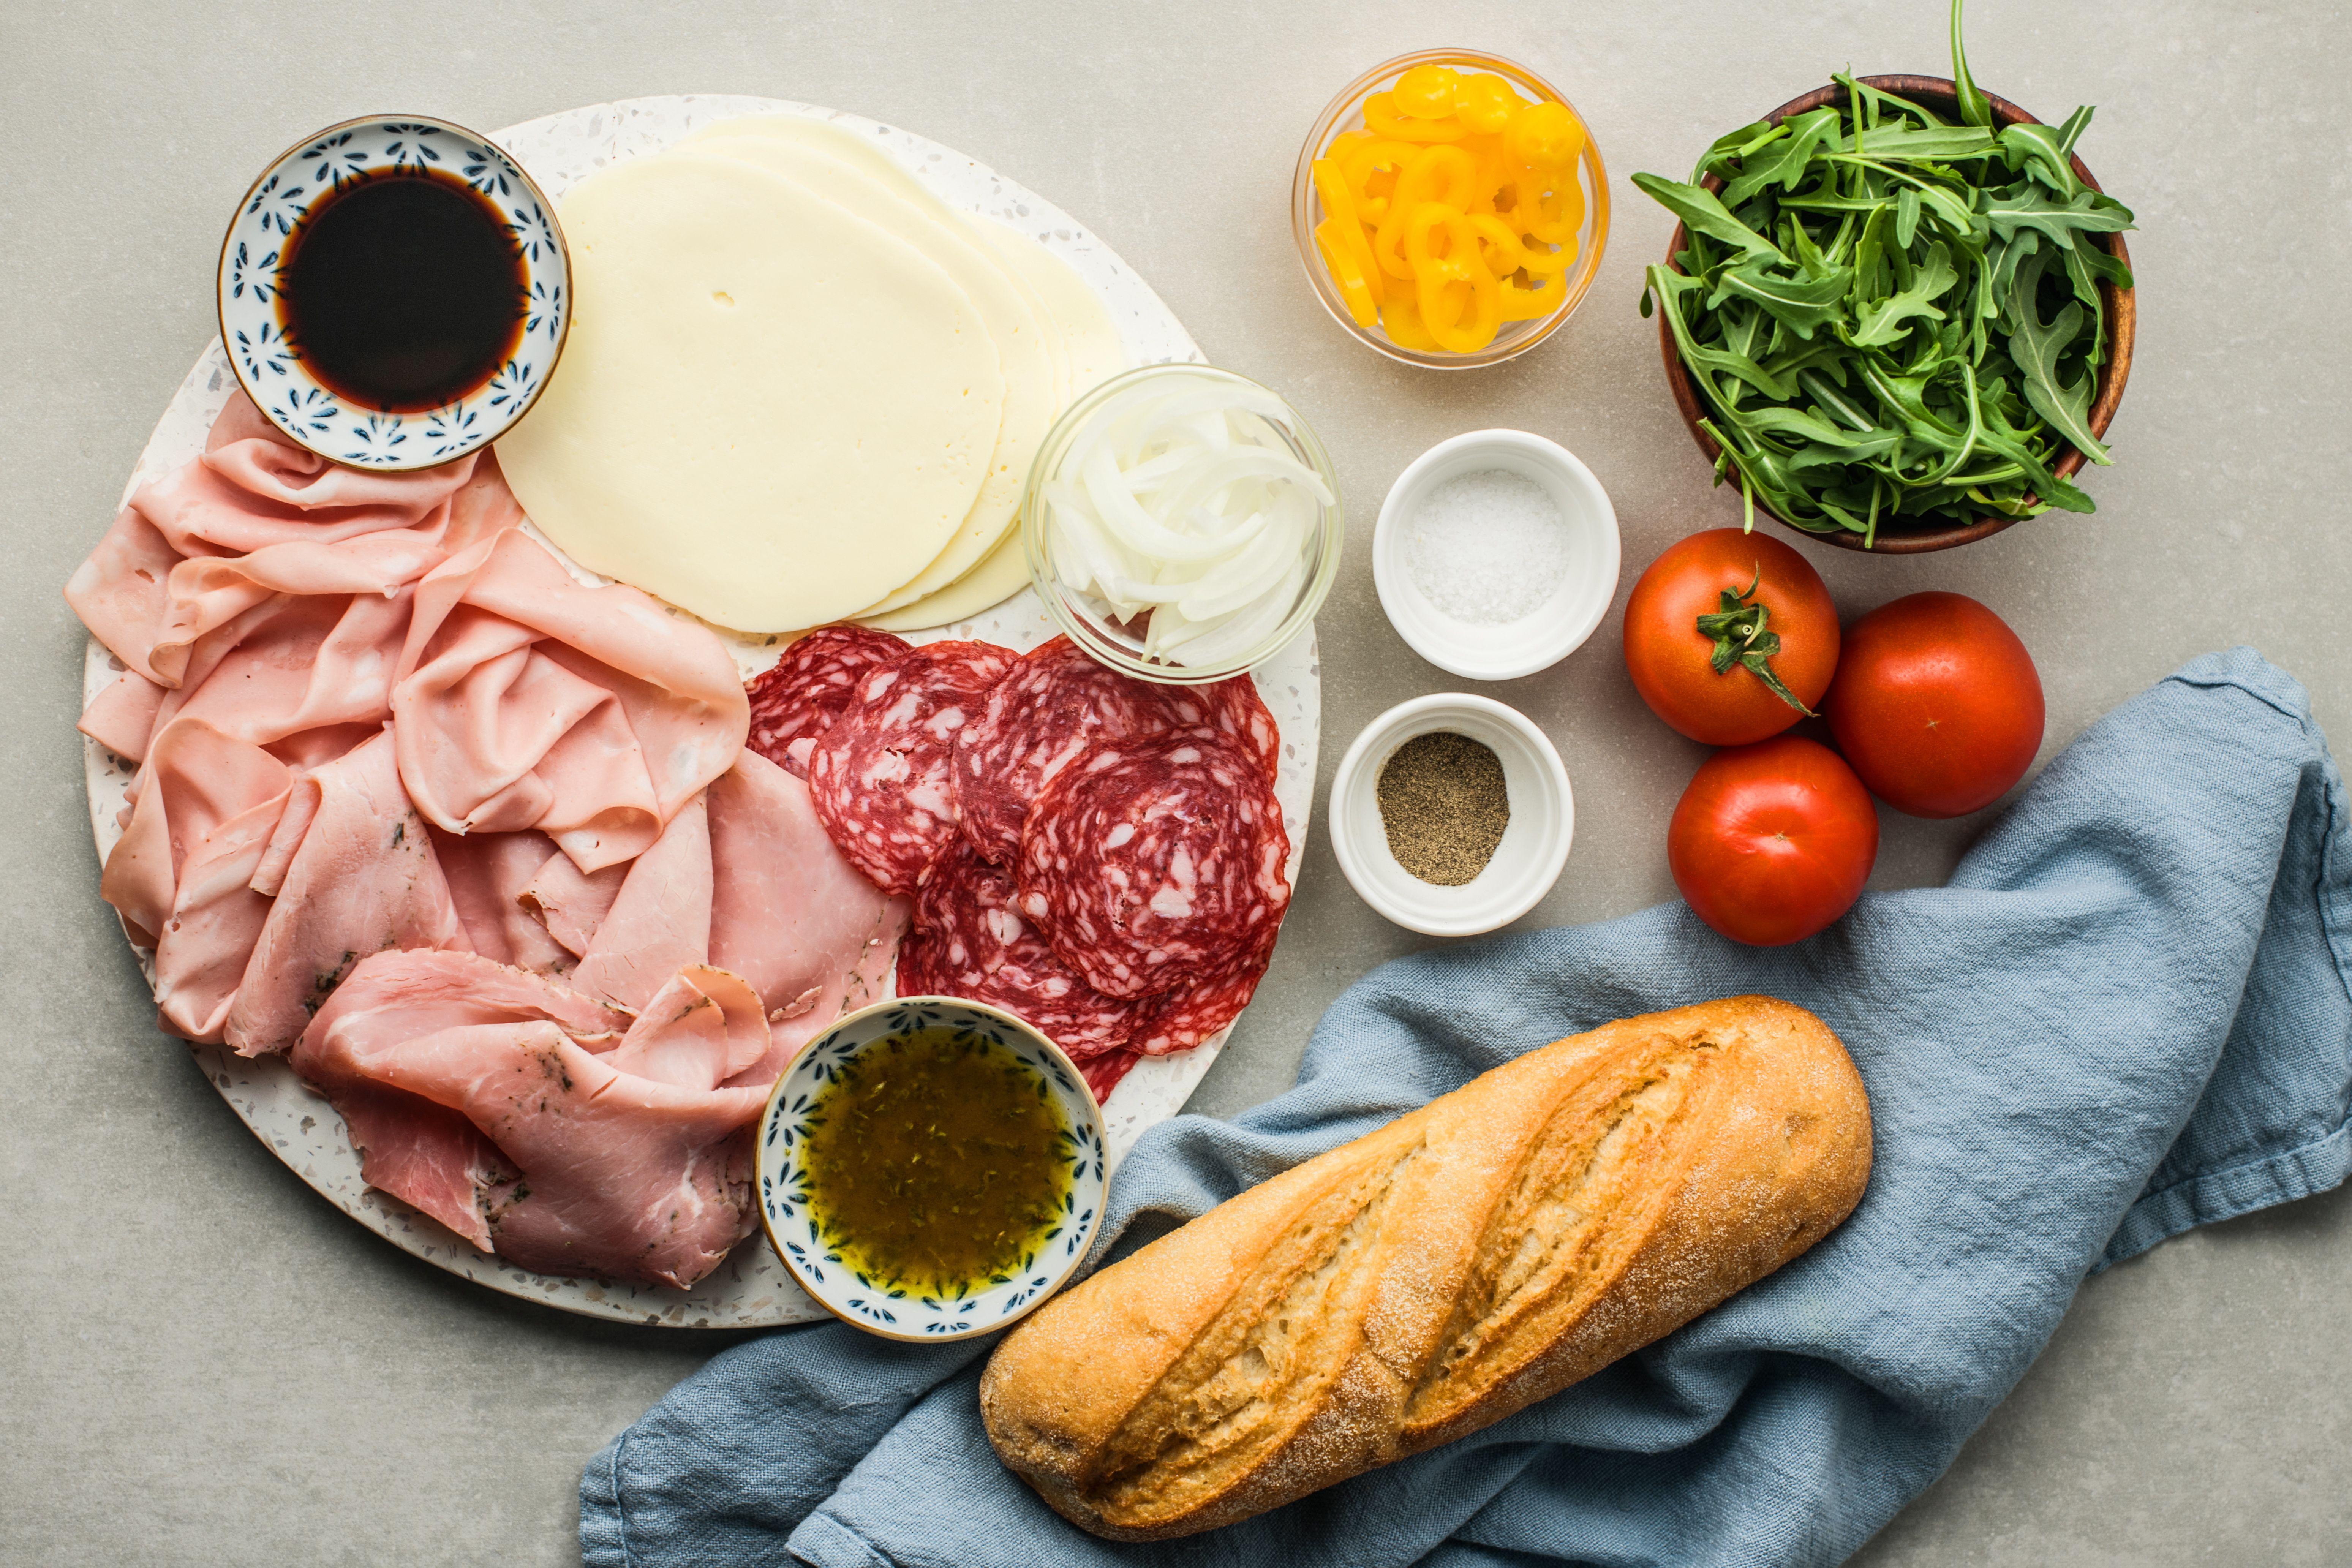 Ingredients for classic Italian sub